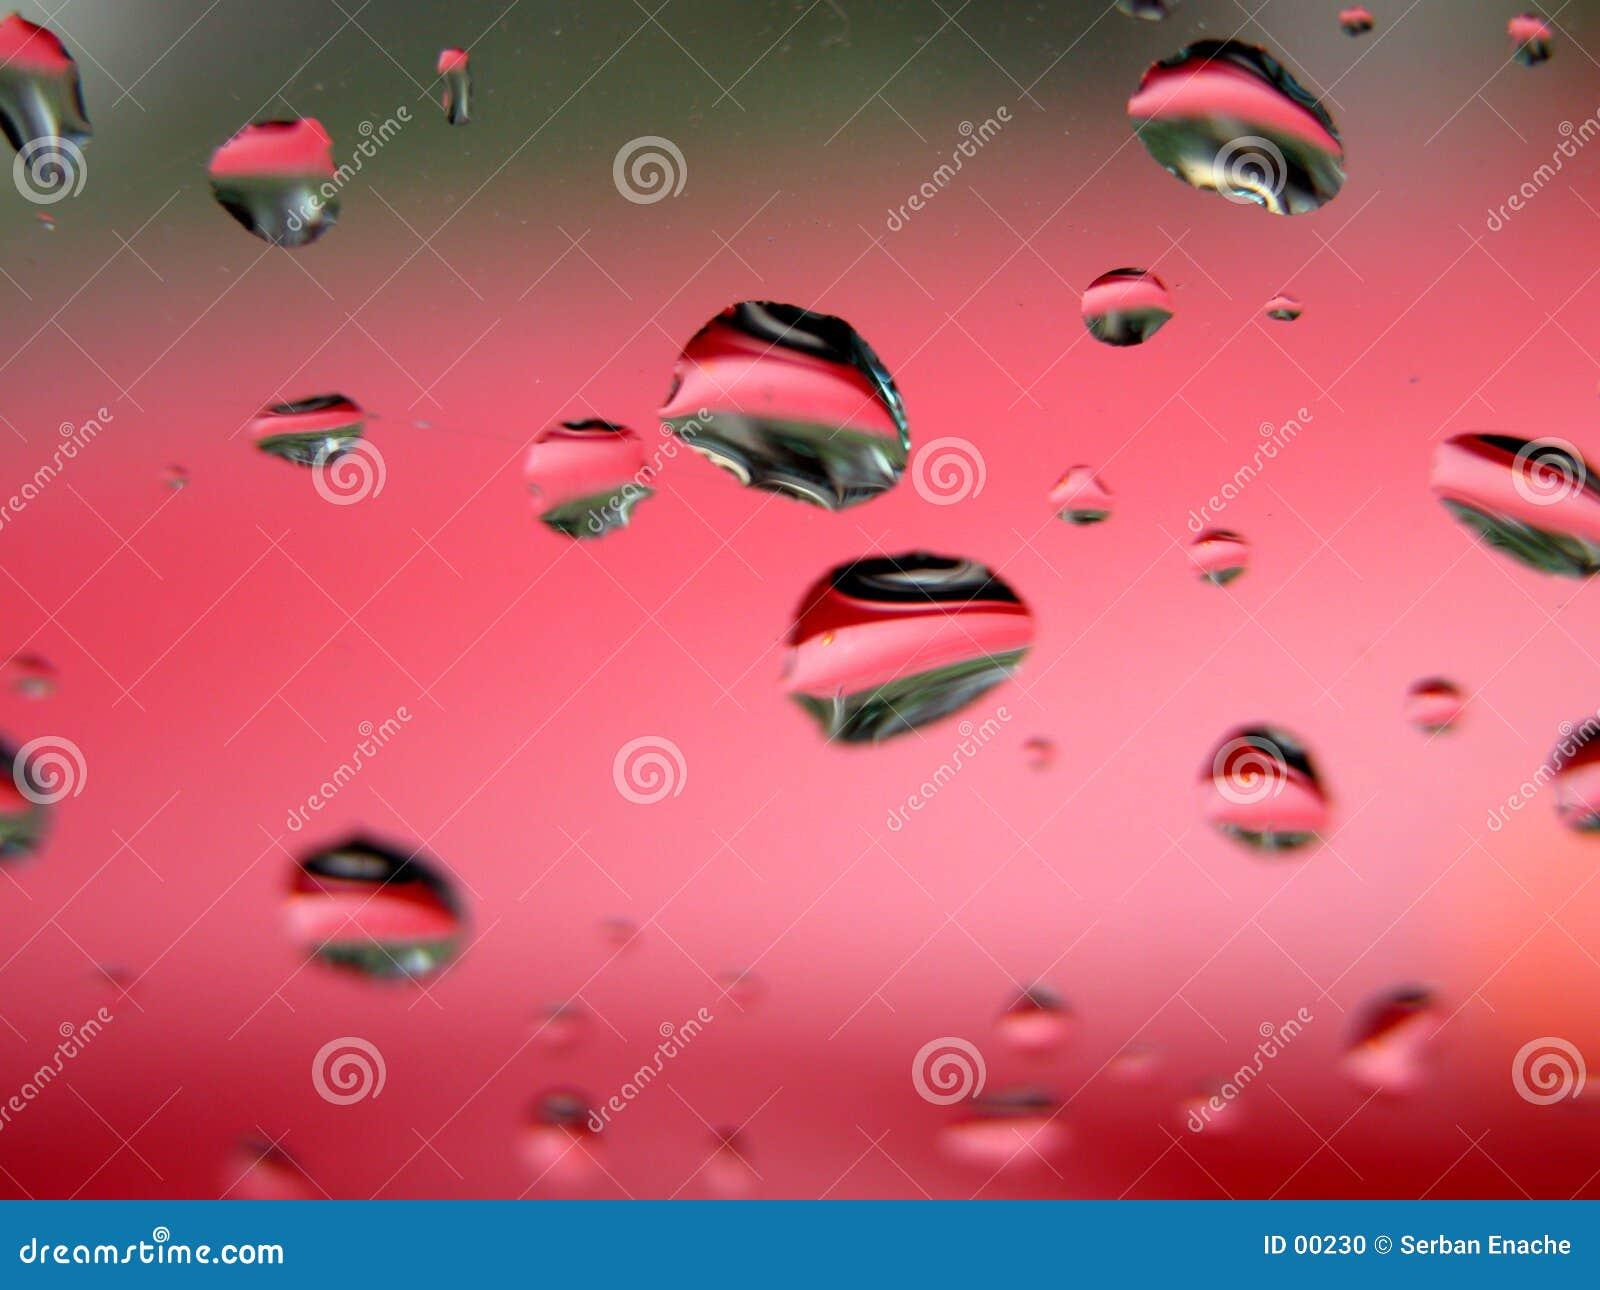 Drops of water - sharp macro